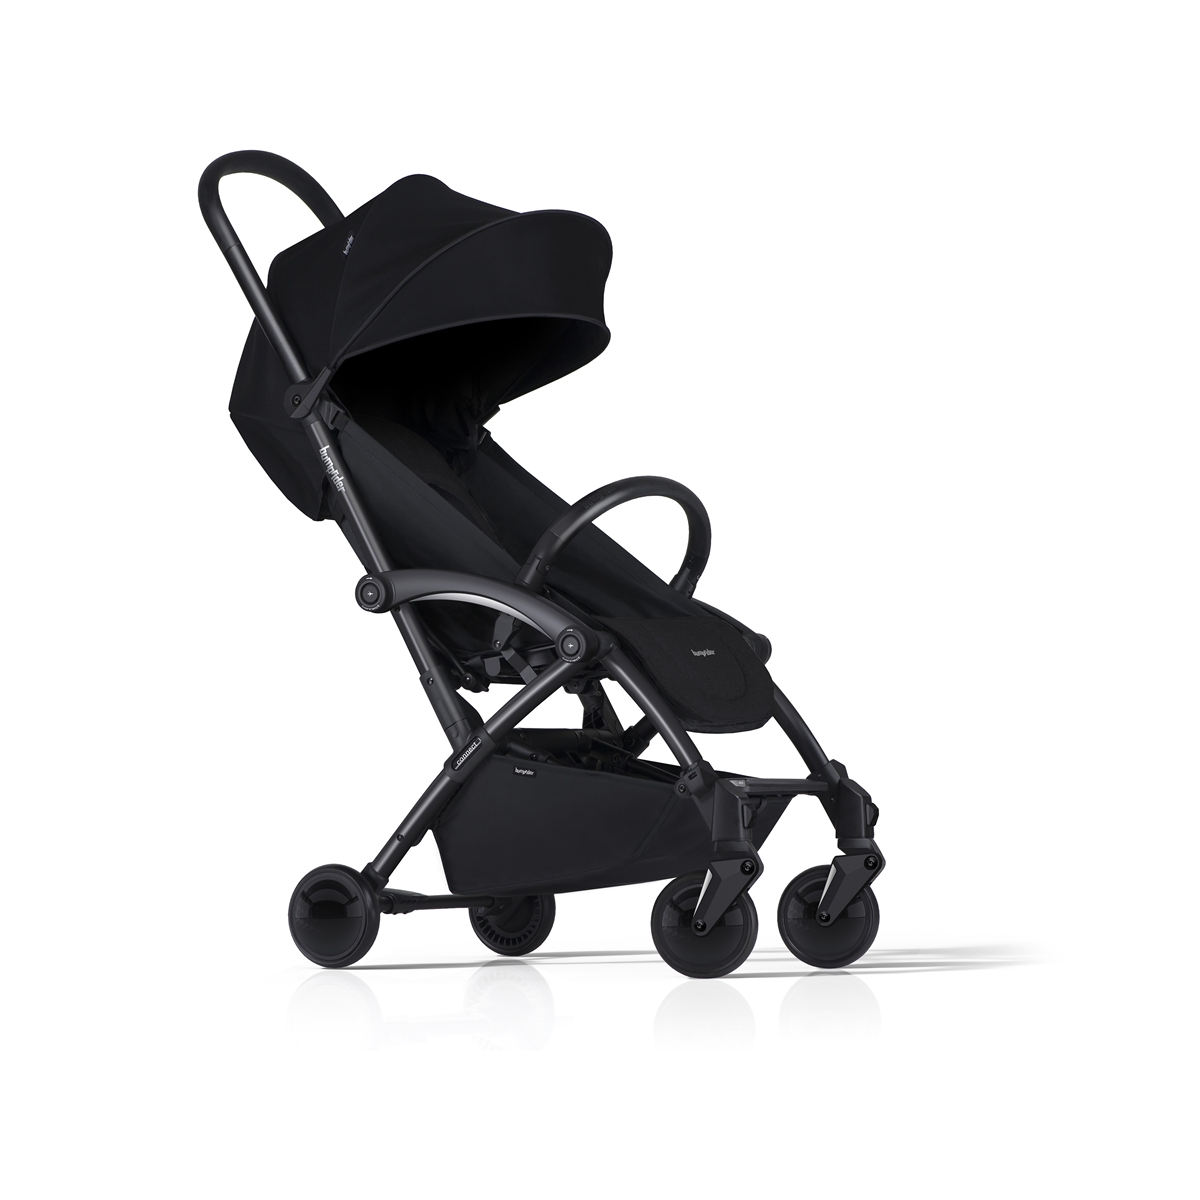 Bumprider Connect Stroller-Black